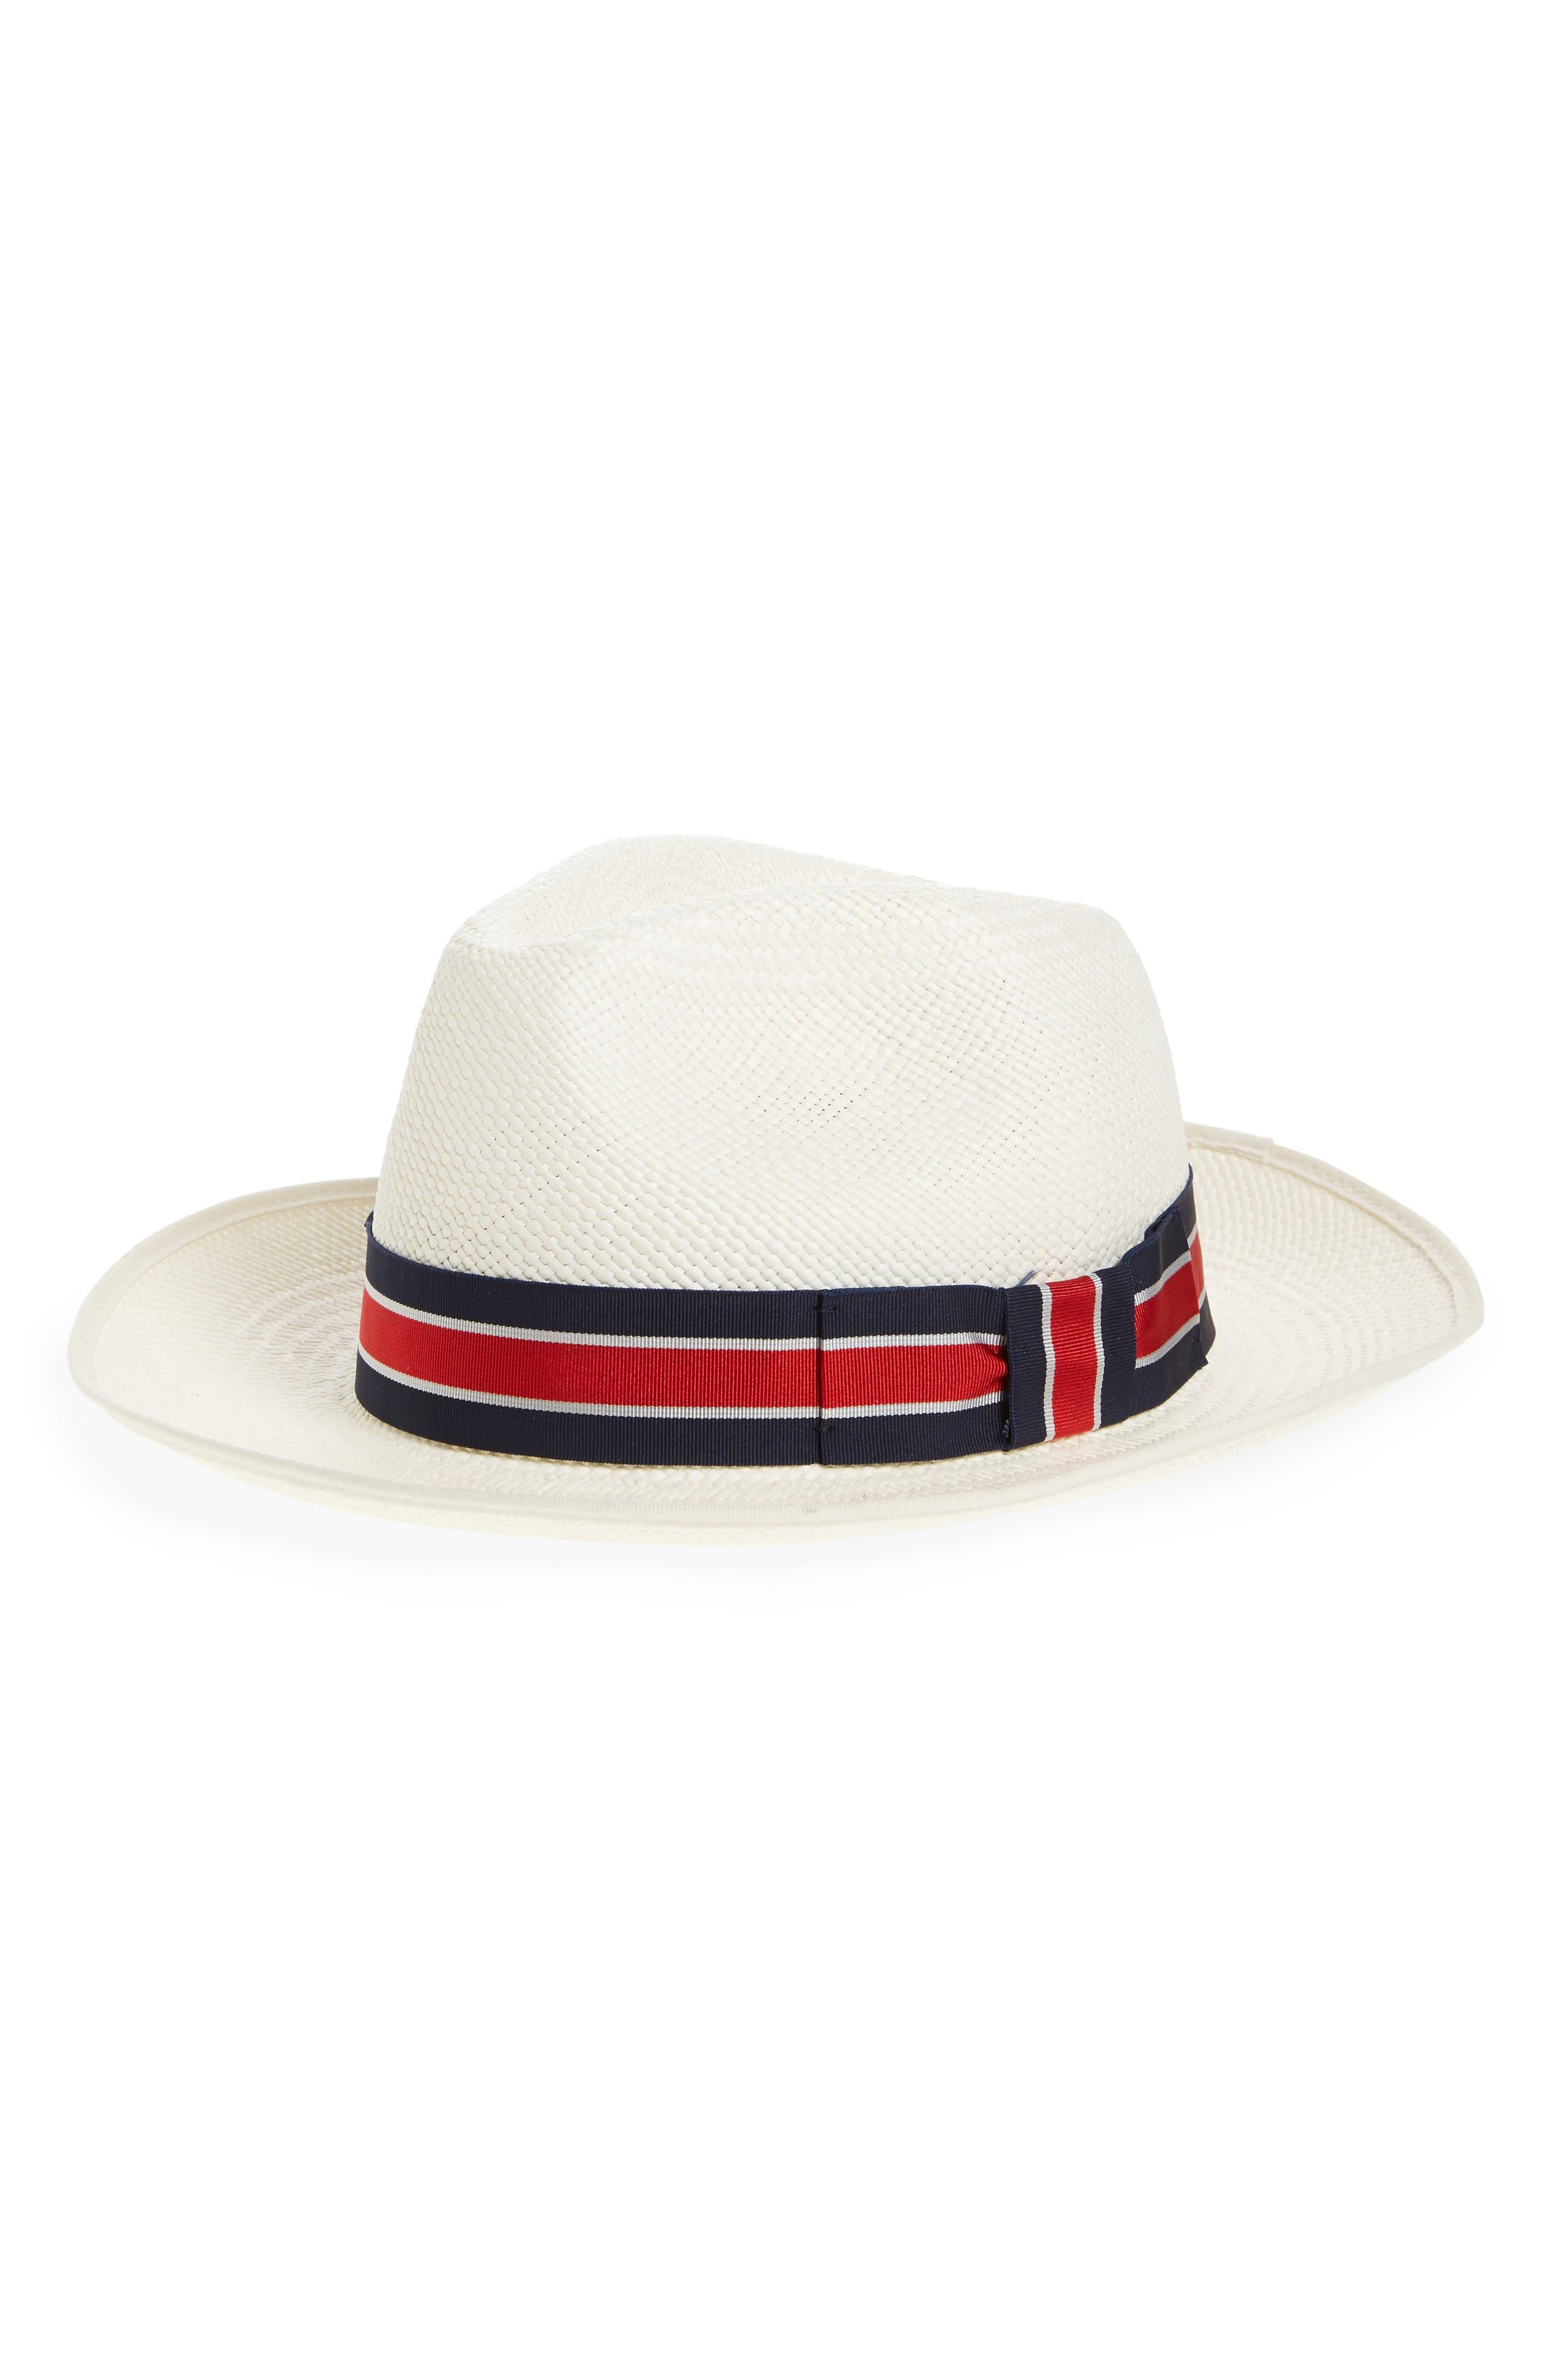 Alternate Image 1 Selected - Christy's Preset Panama Hat